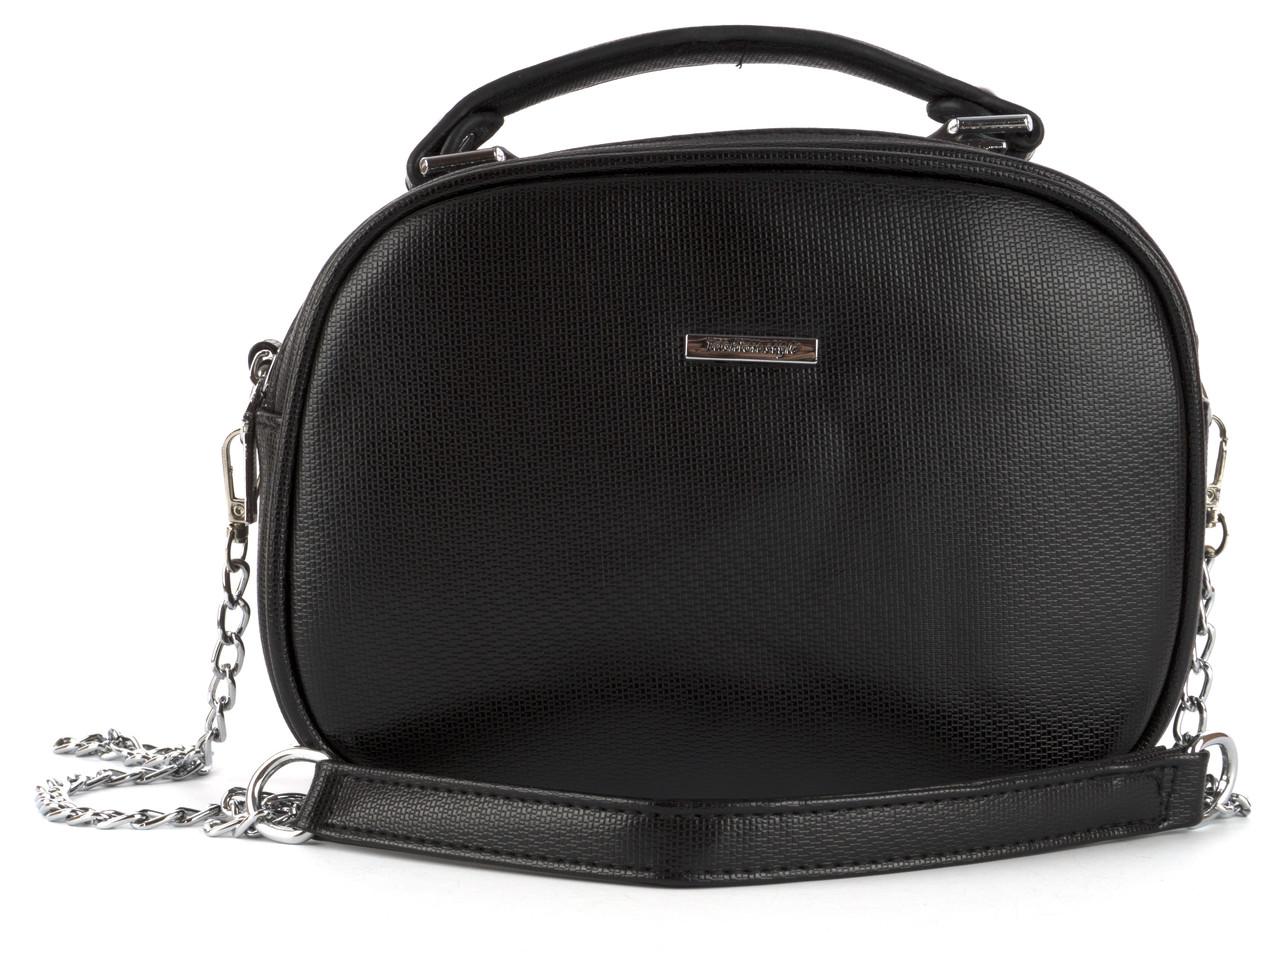 Стильна жіноча містка сумка ERICK art. 66094